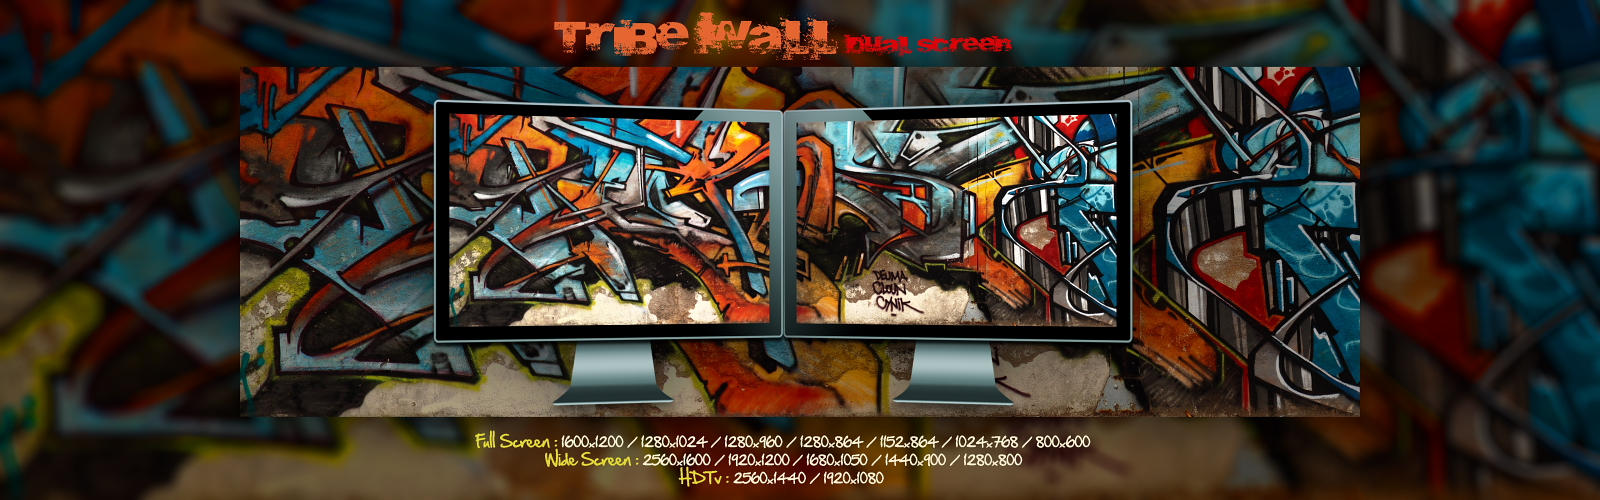 Tribe Wall  -  Dual Screen